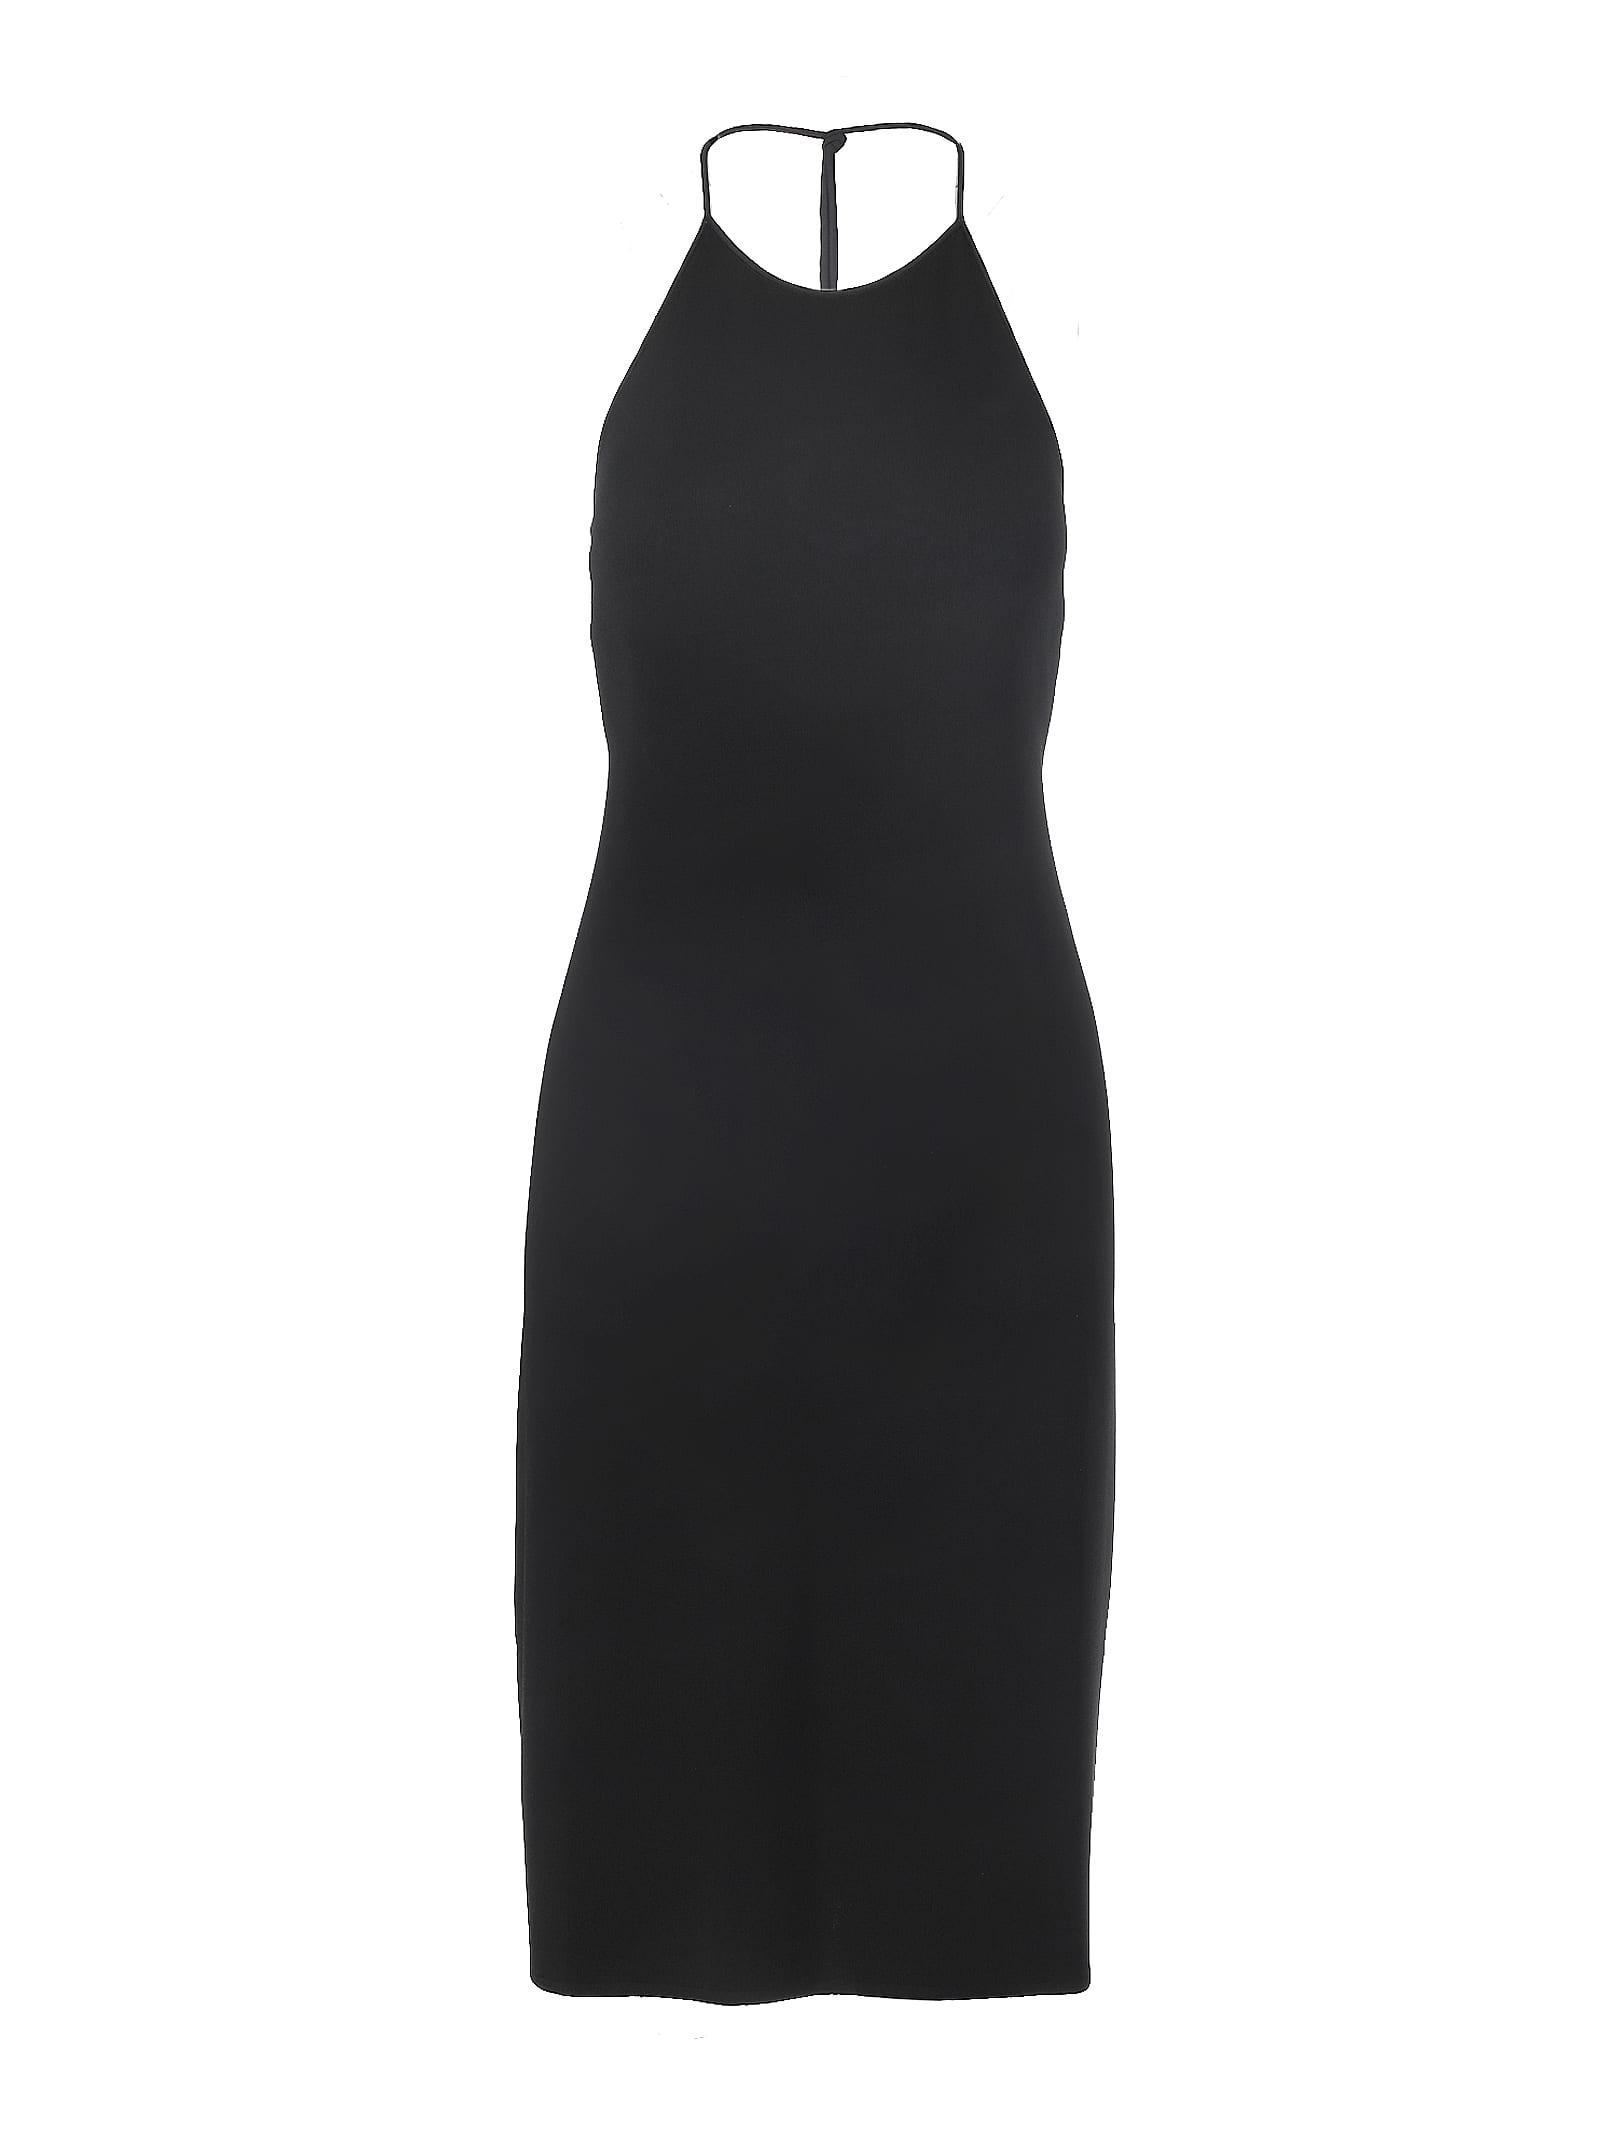 Buy Bottega Veneta Backless Dress online, shop Bottega Veneta with free shipping